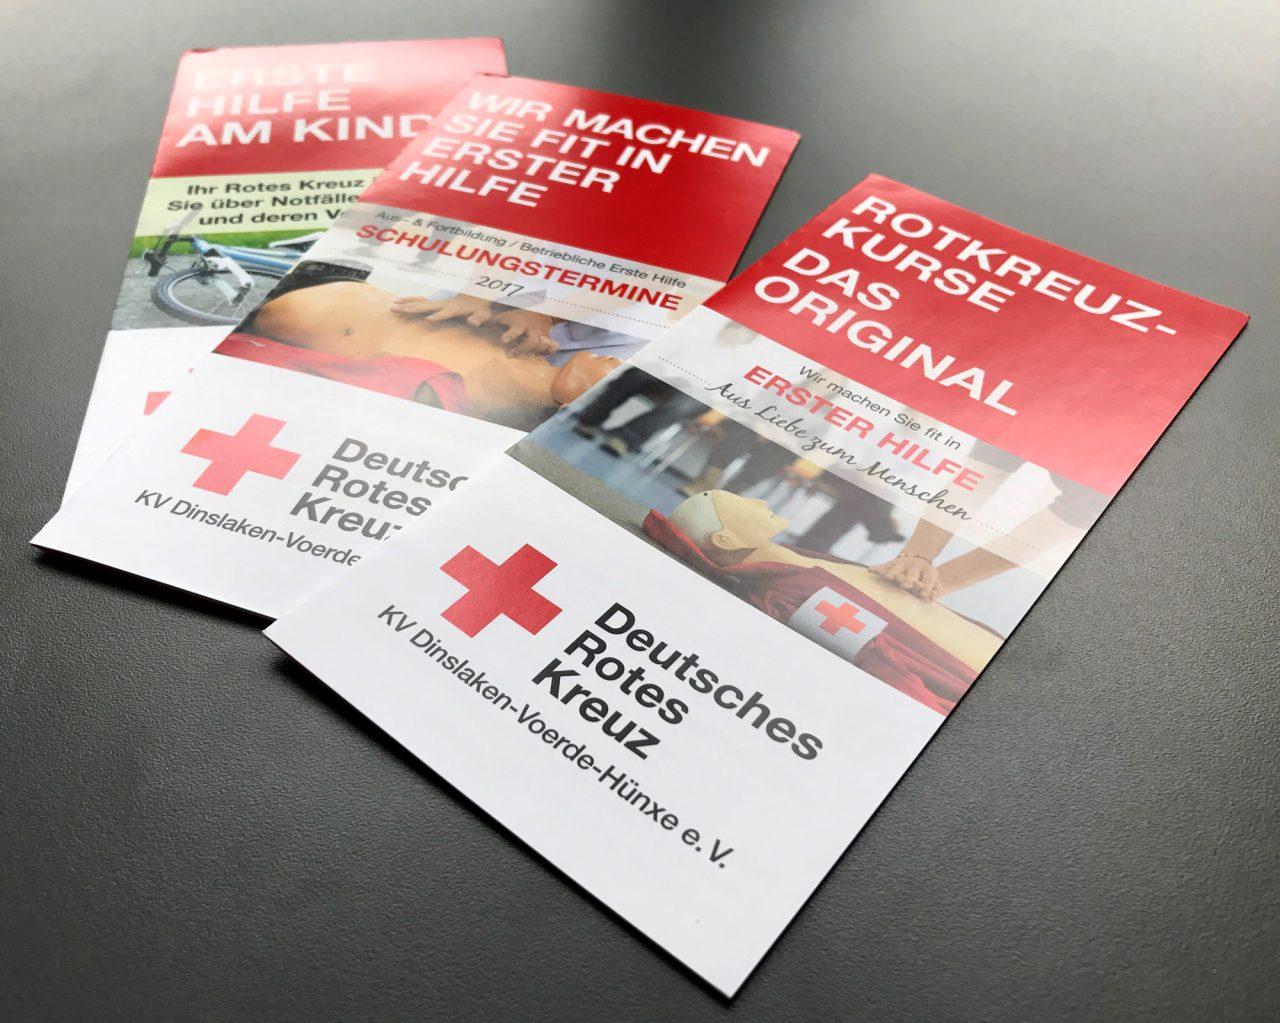 Deutsches Rotes Kreuz – Kreisverband Dinslaken Voerde Hünxe e.V.